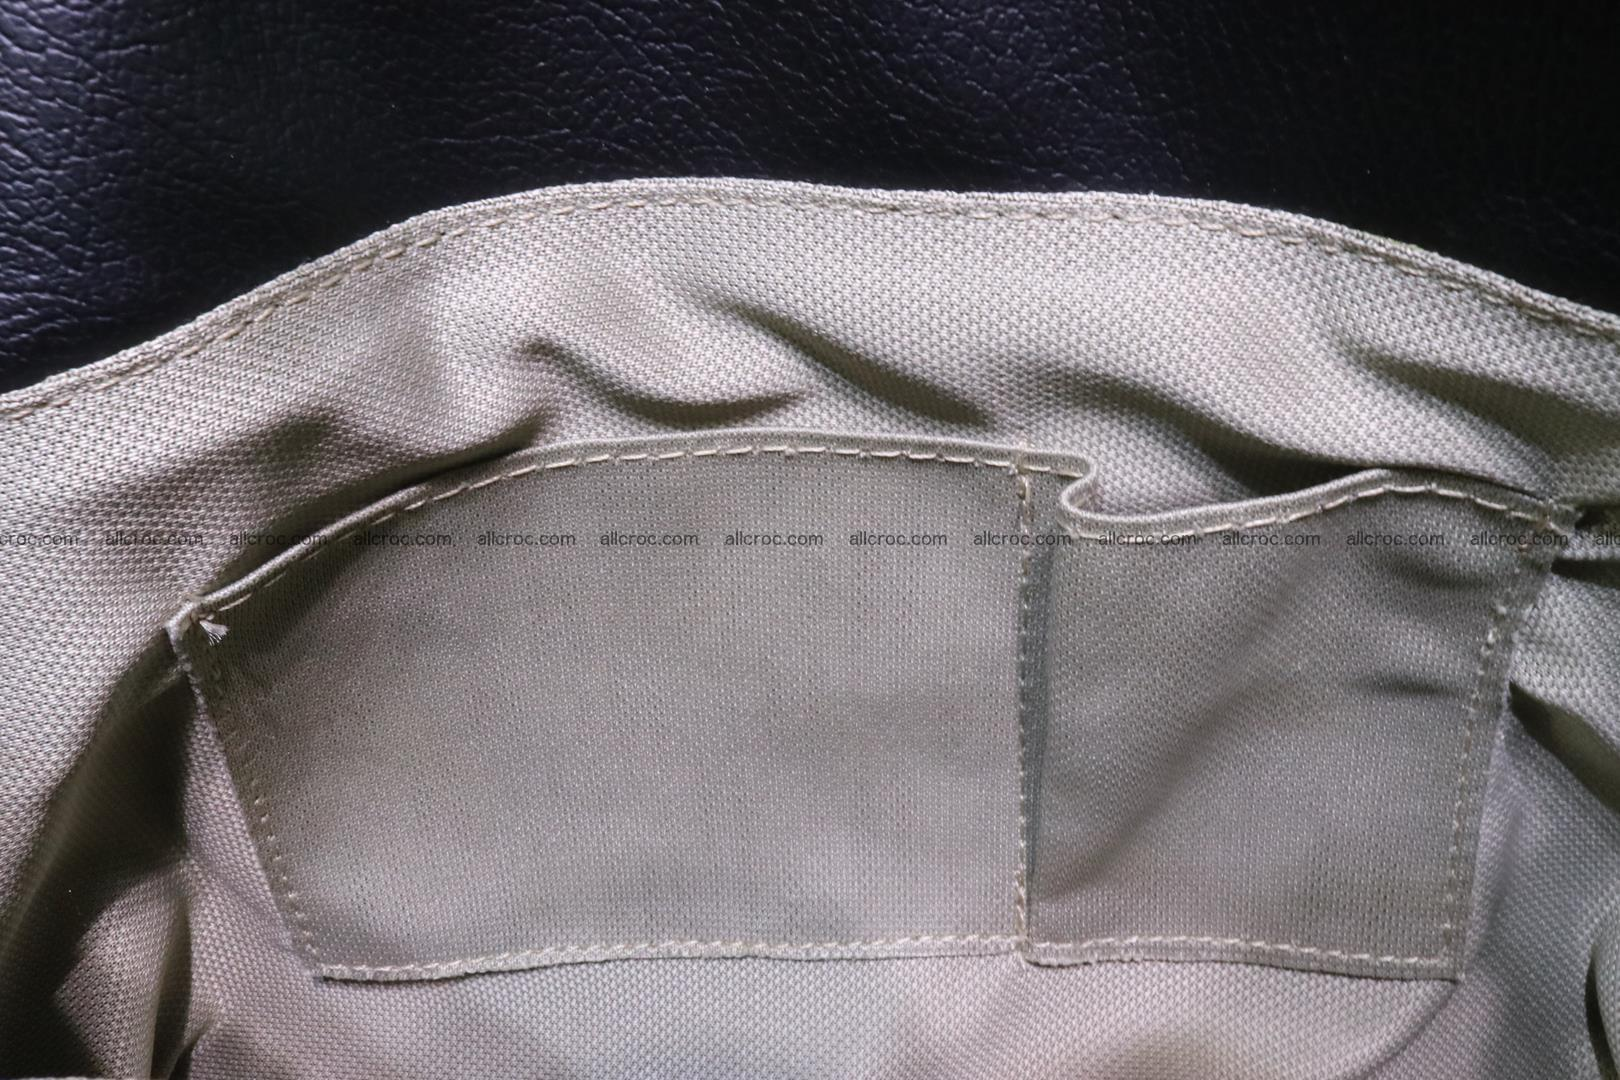 Handbag from cobra skin for lady 188 Foto 13